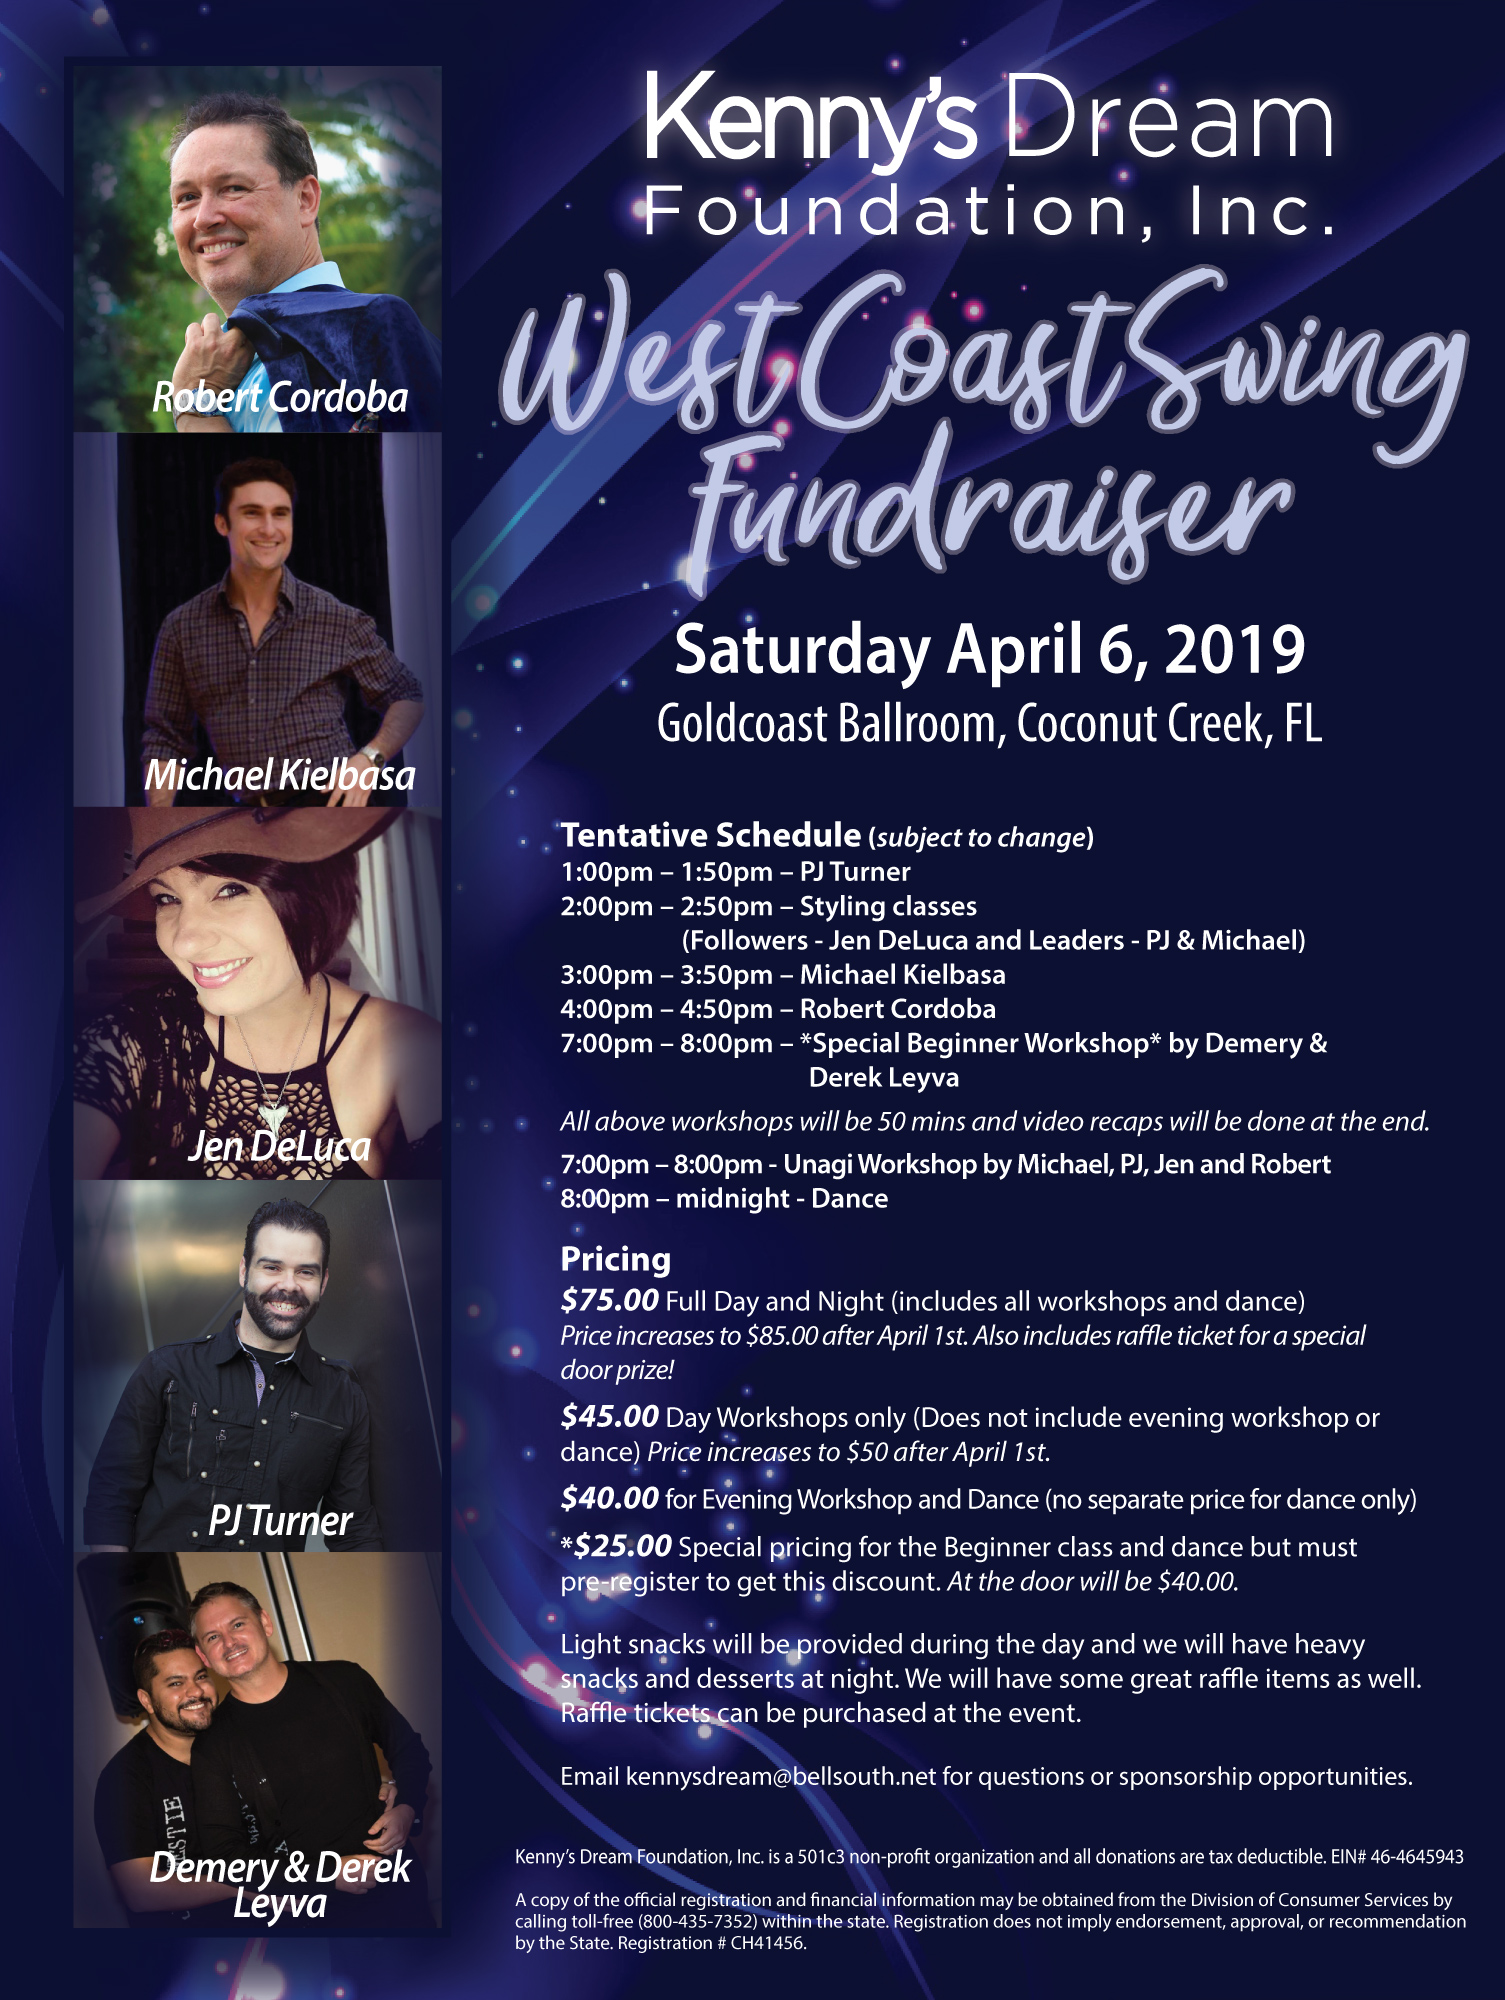 WCS Fundraiser for Kenny's Dream Foundation - Workshops 1 - 8 pm - Dance 8 pm - Midnight - Organized by Dawn Sgarlata